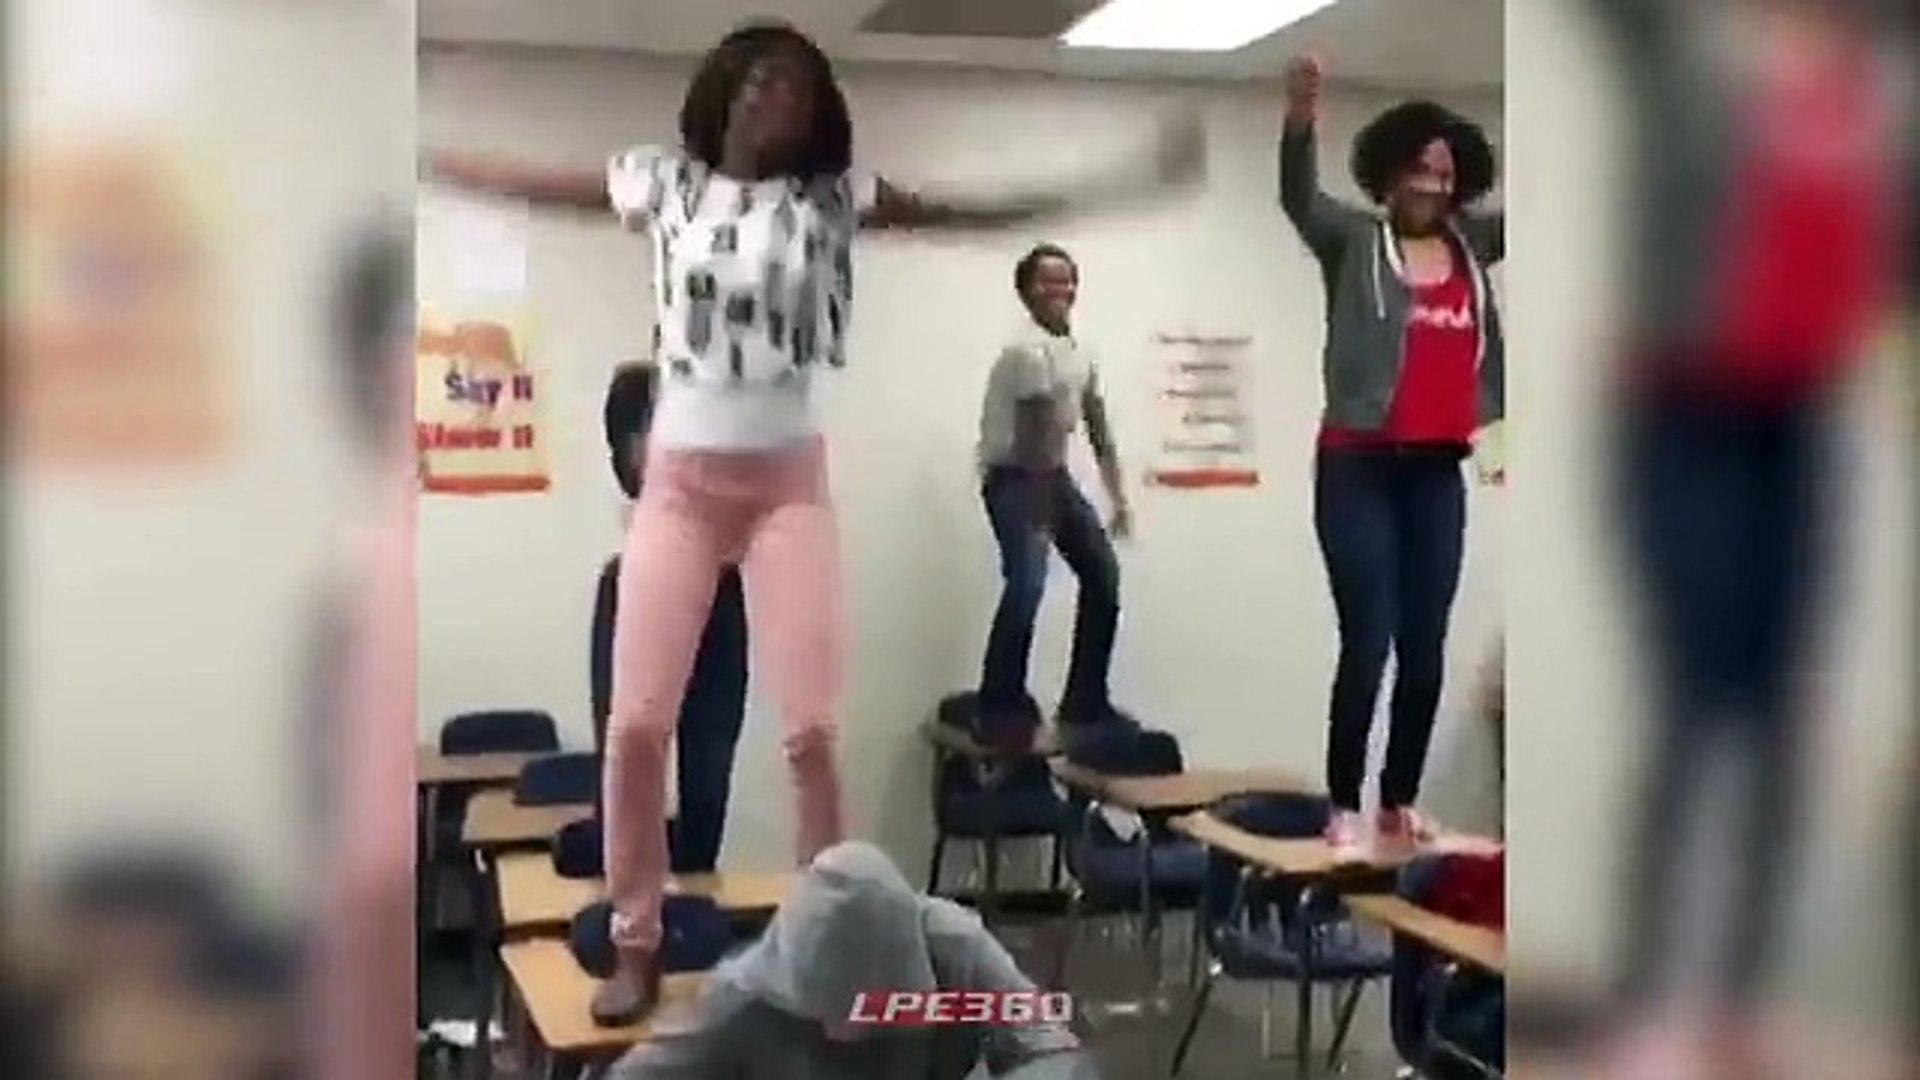 Dancing Girl Knocked Off School Desk And Falls